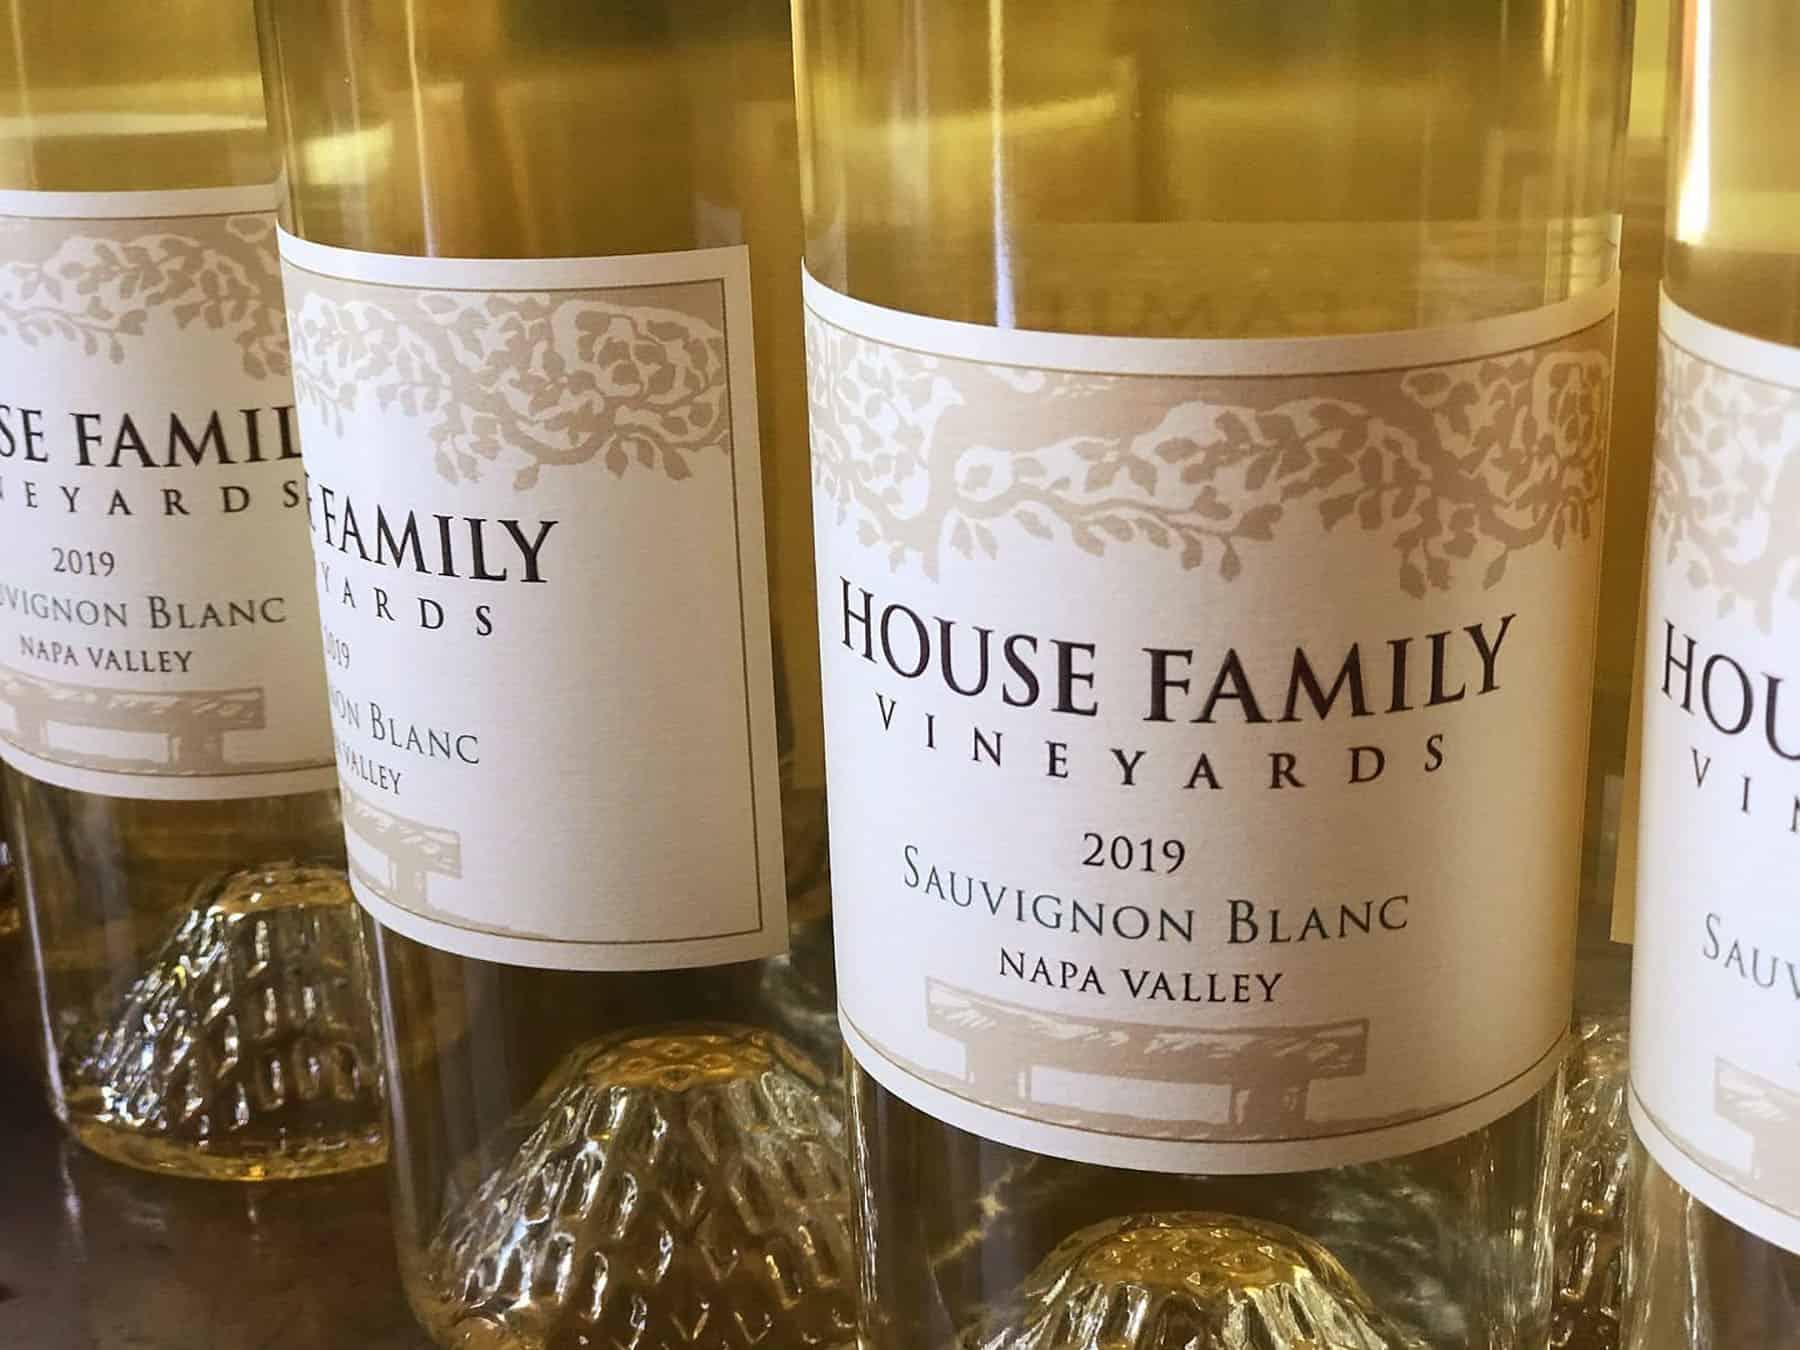 House Family Vineyards Sauvignon Blanc bottles